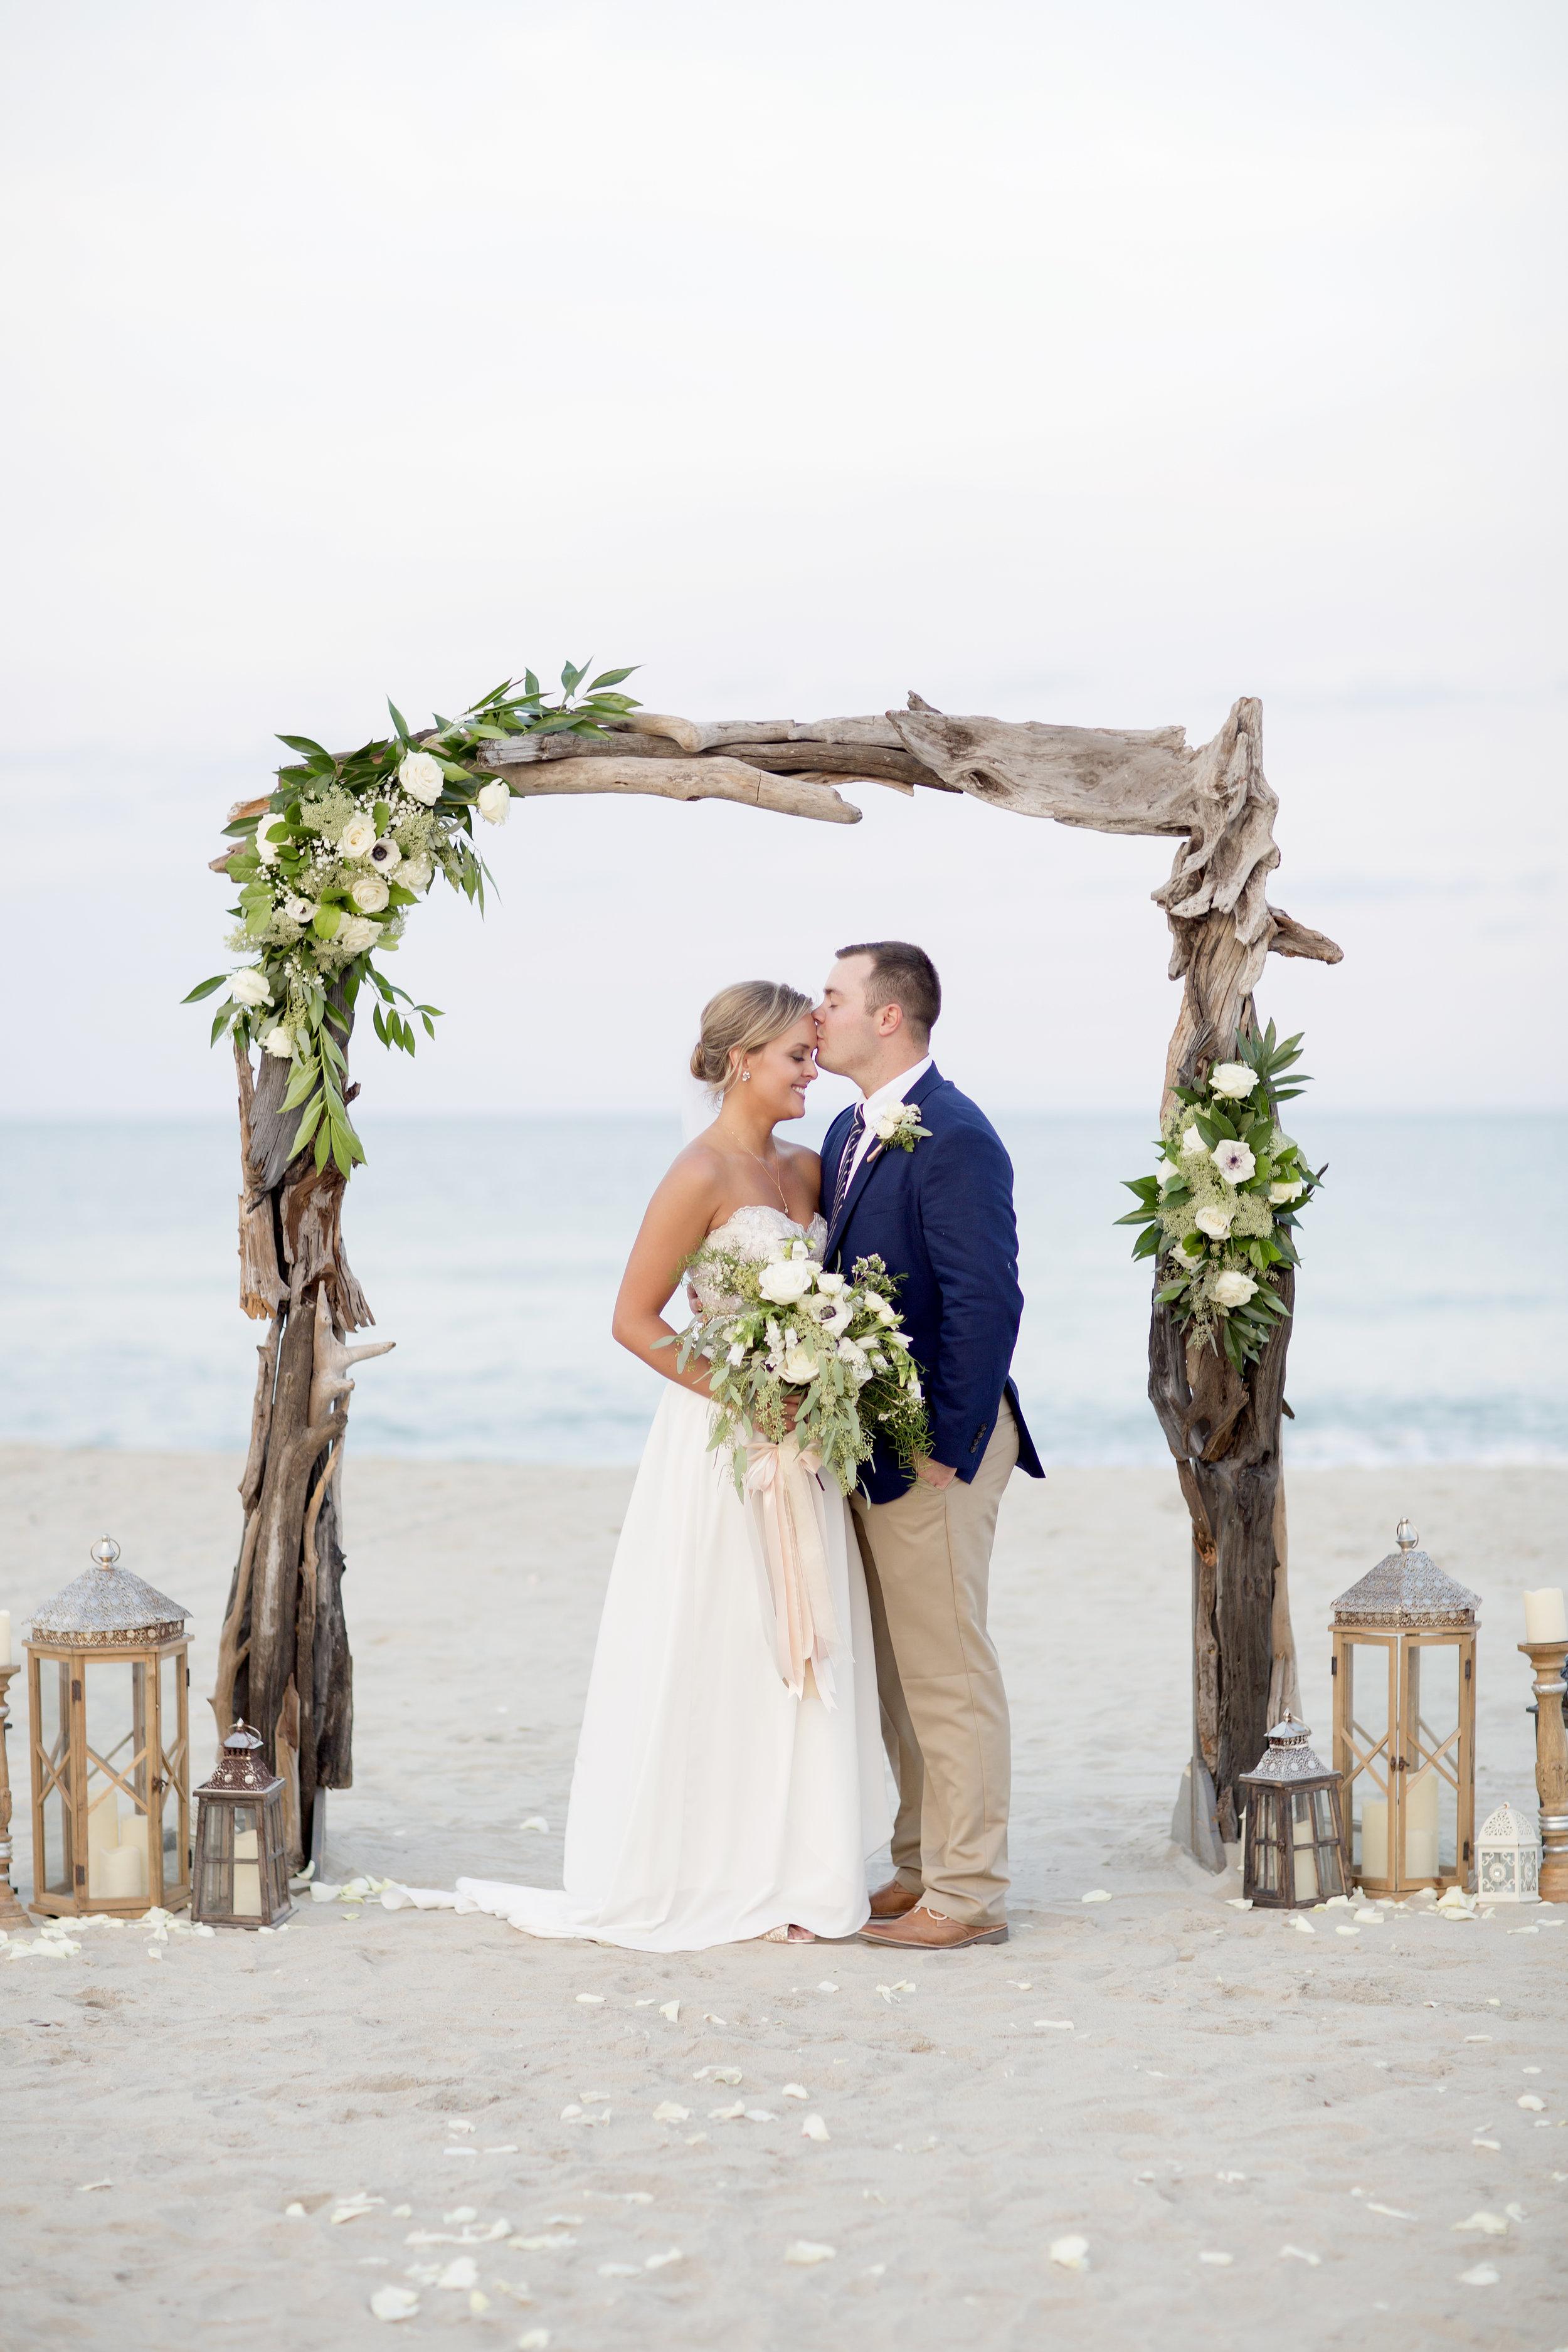 20170827_carroll_wedding_1690.jpg